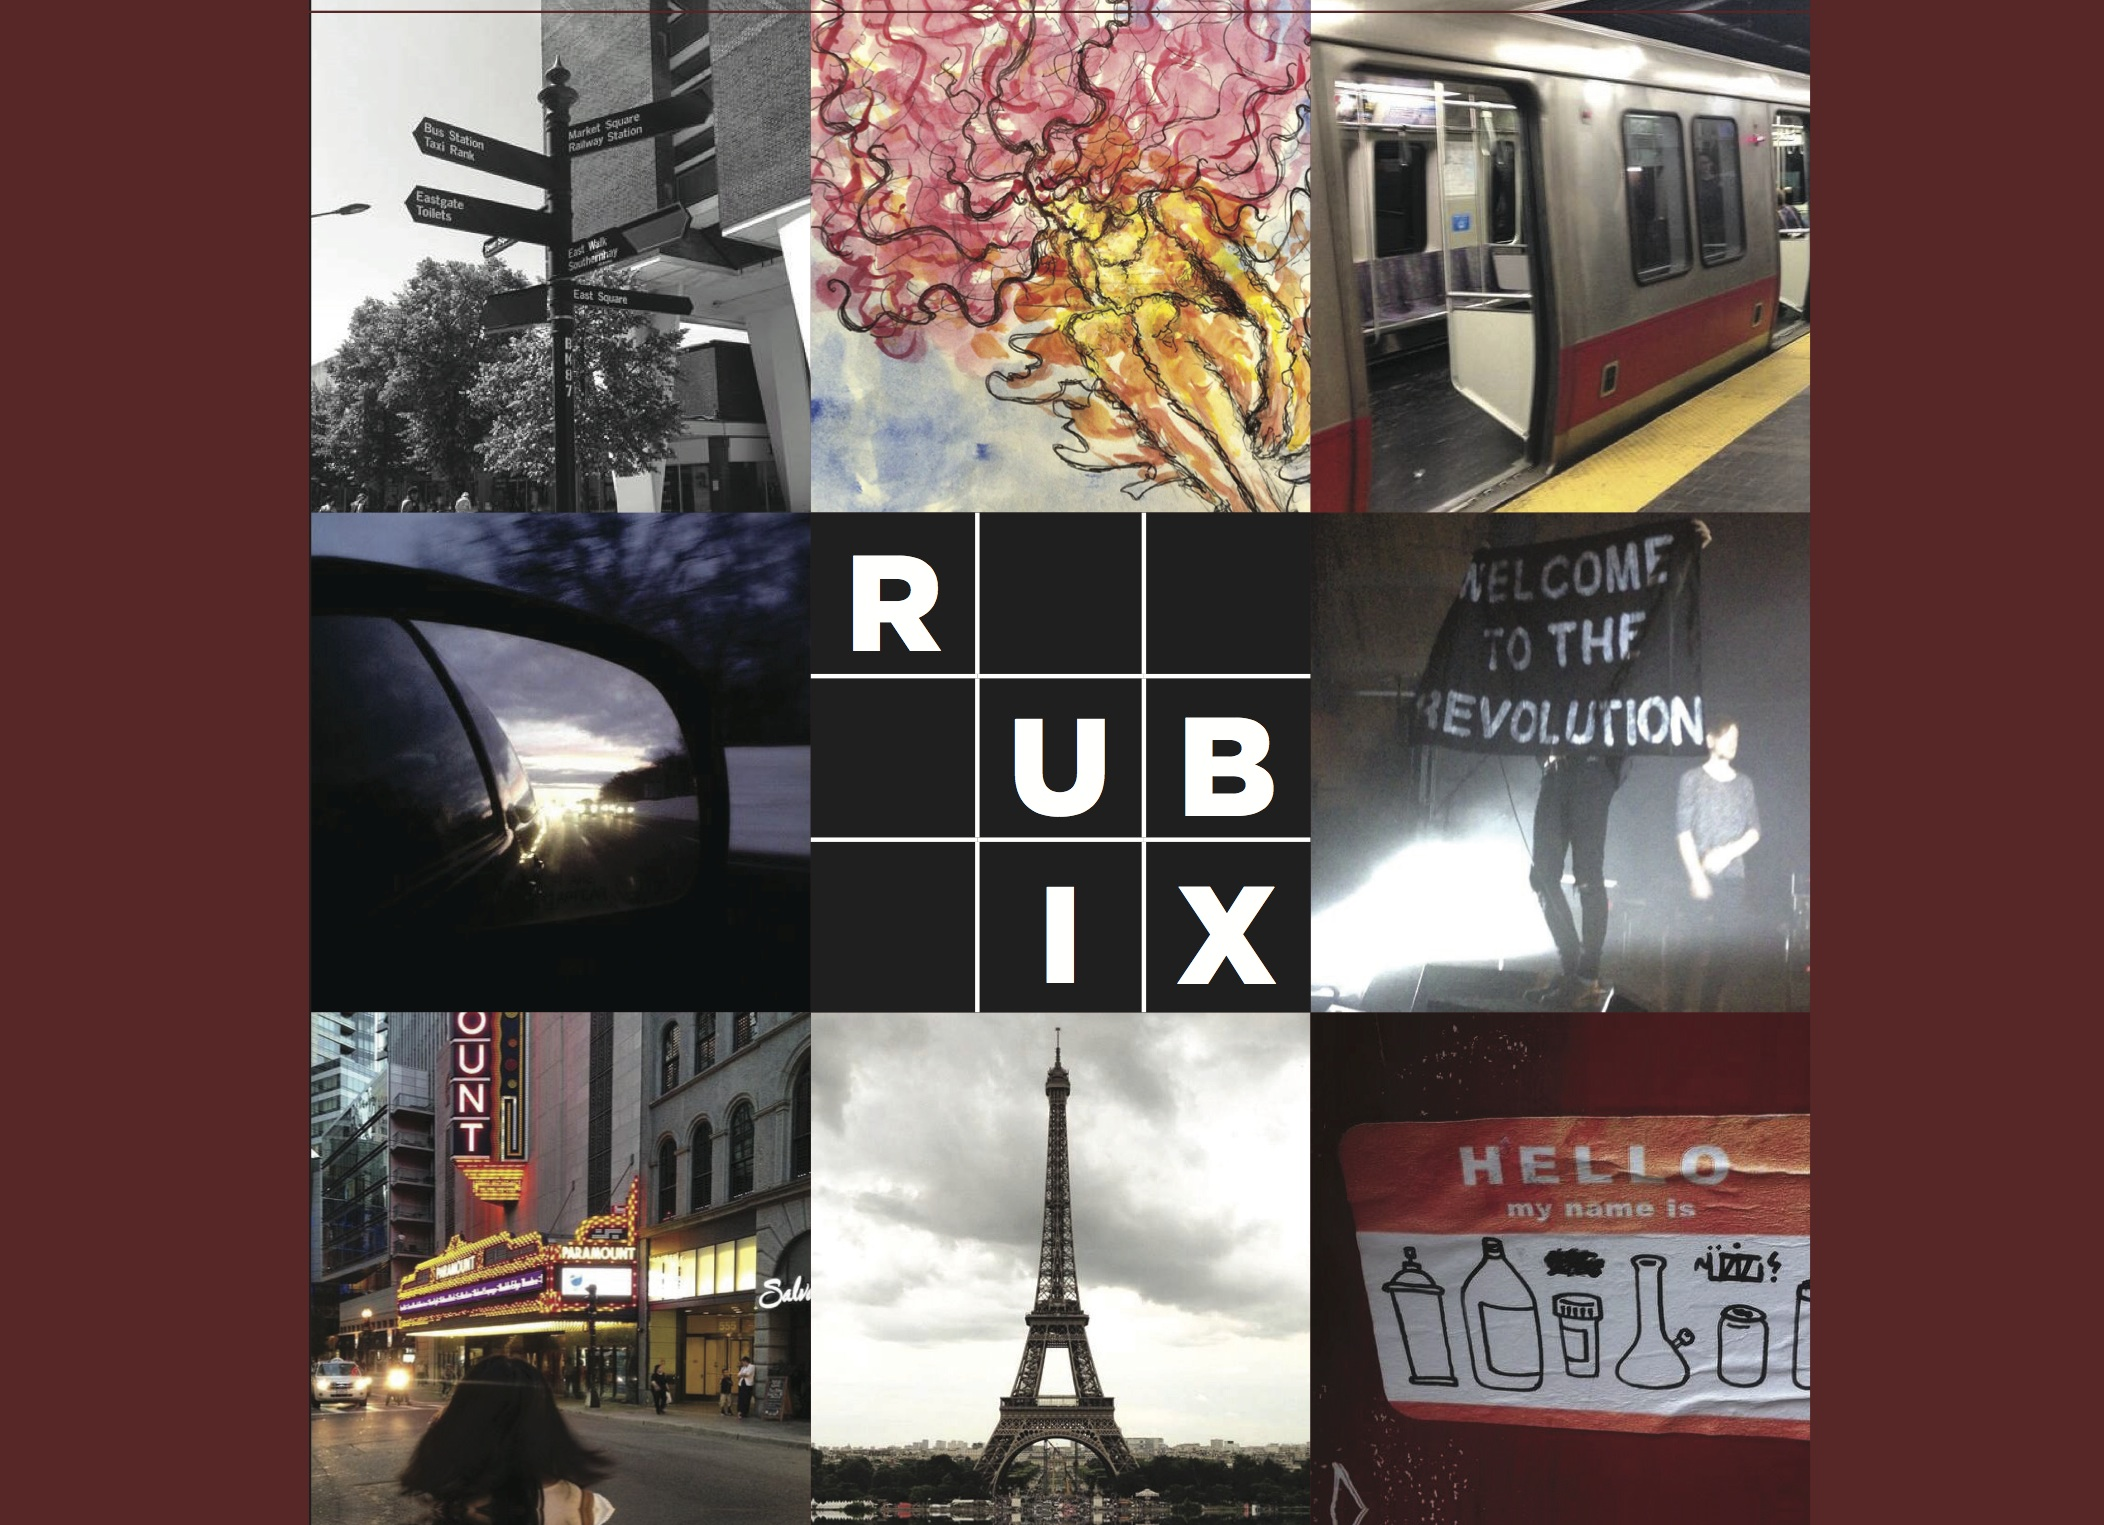 826_rubix